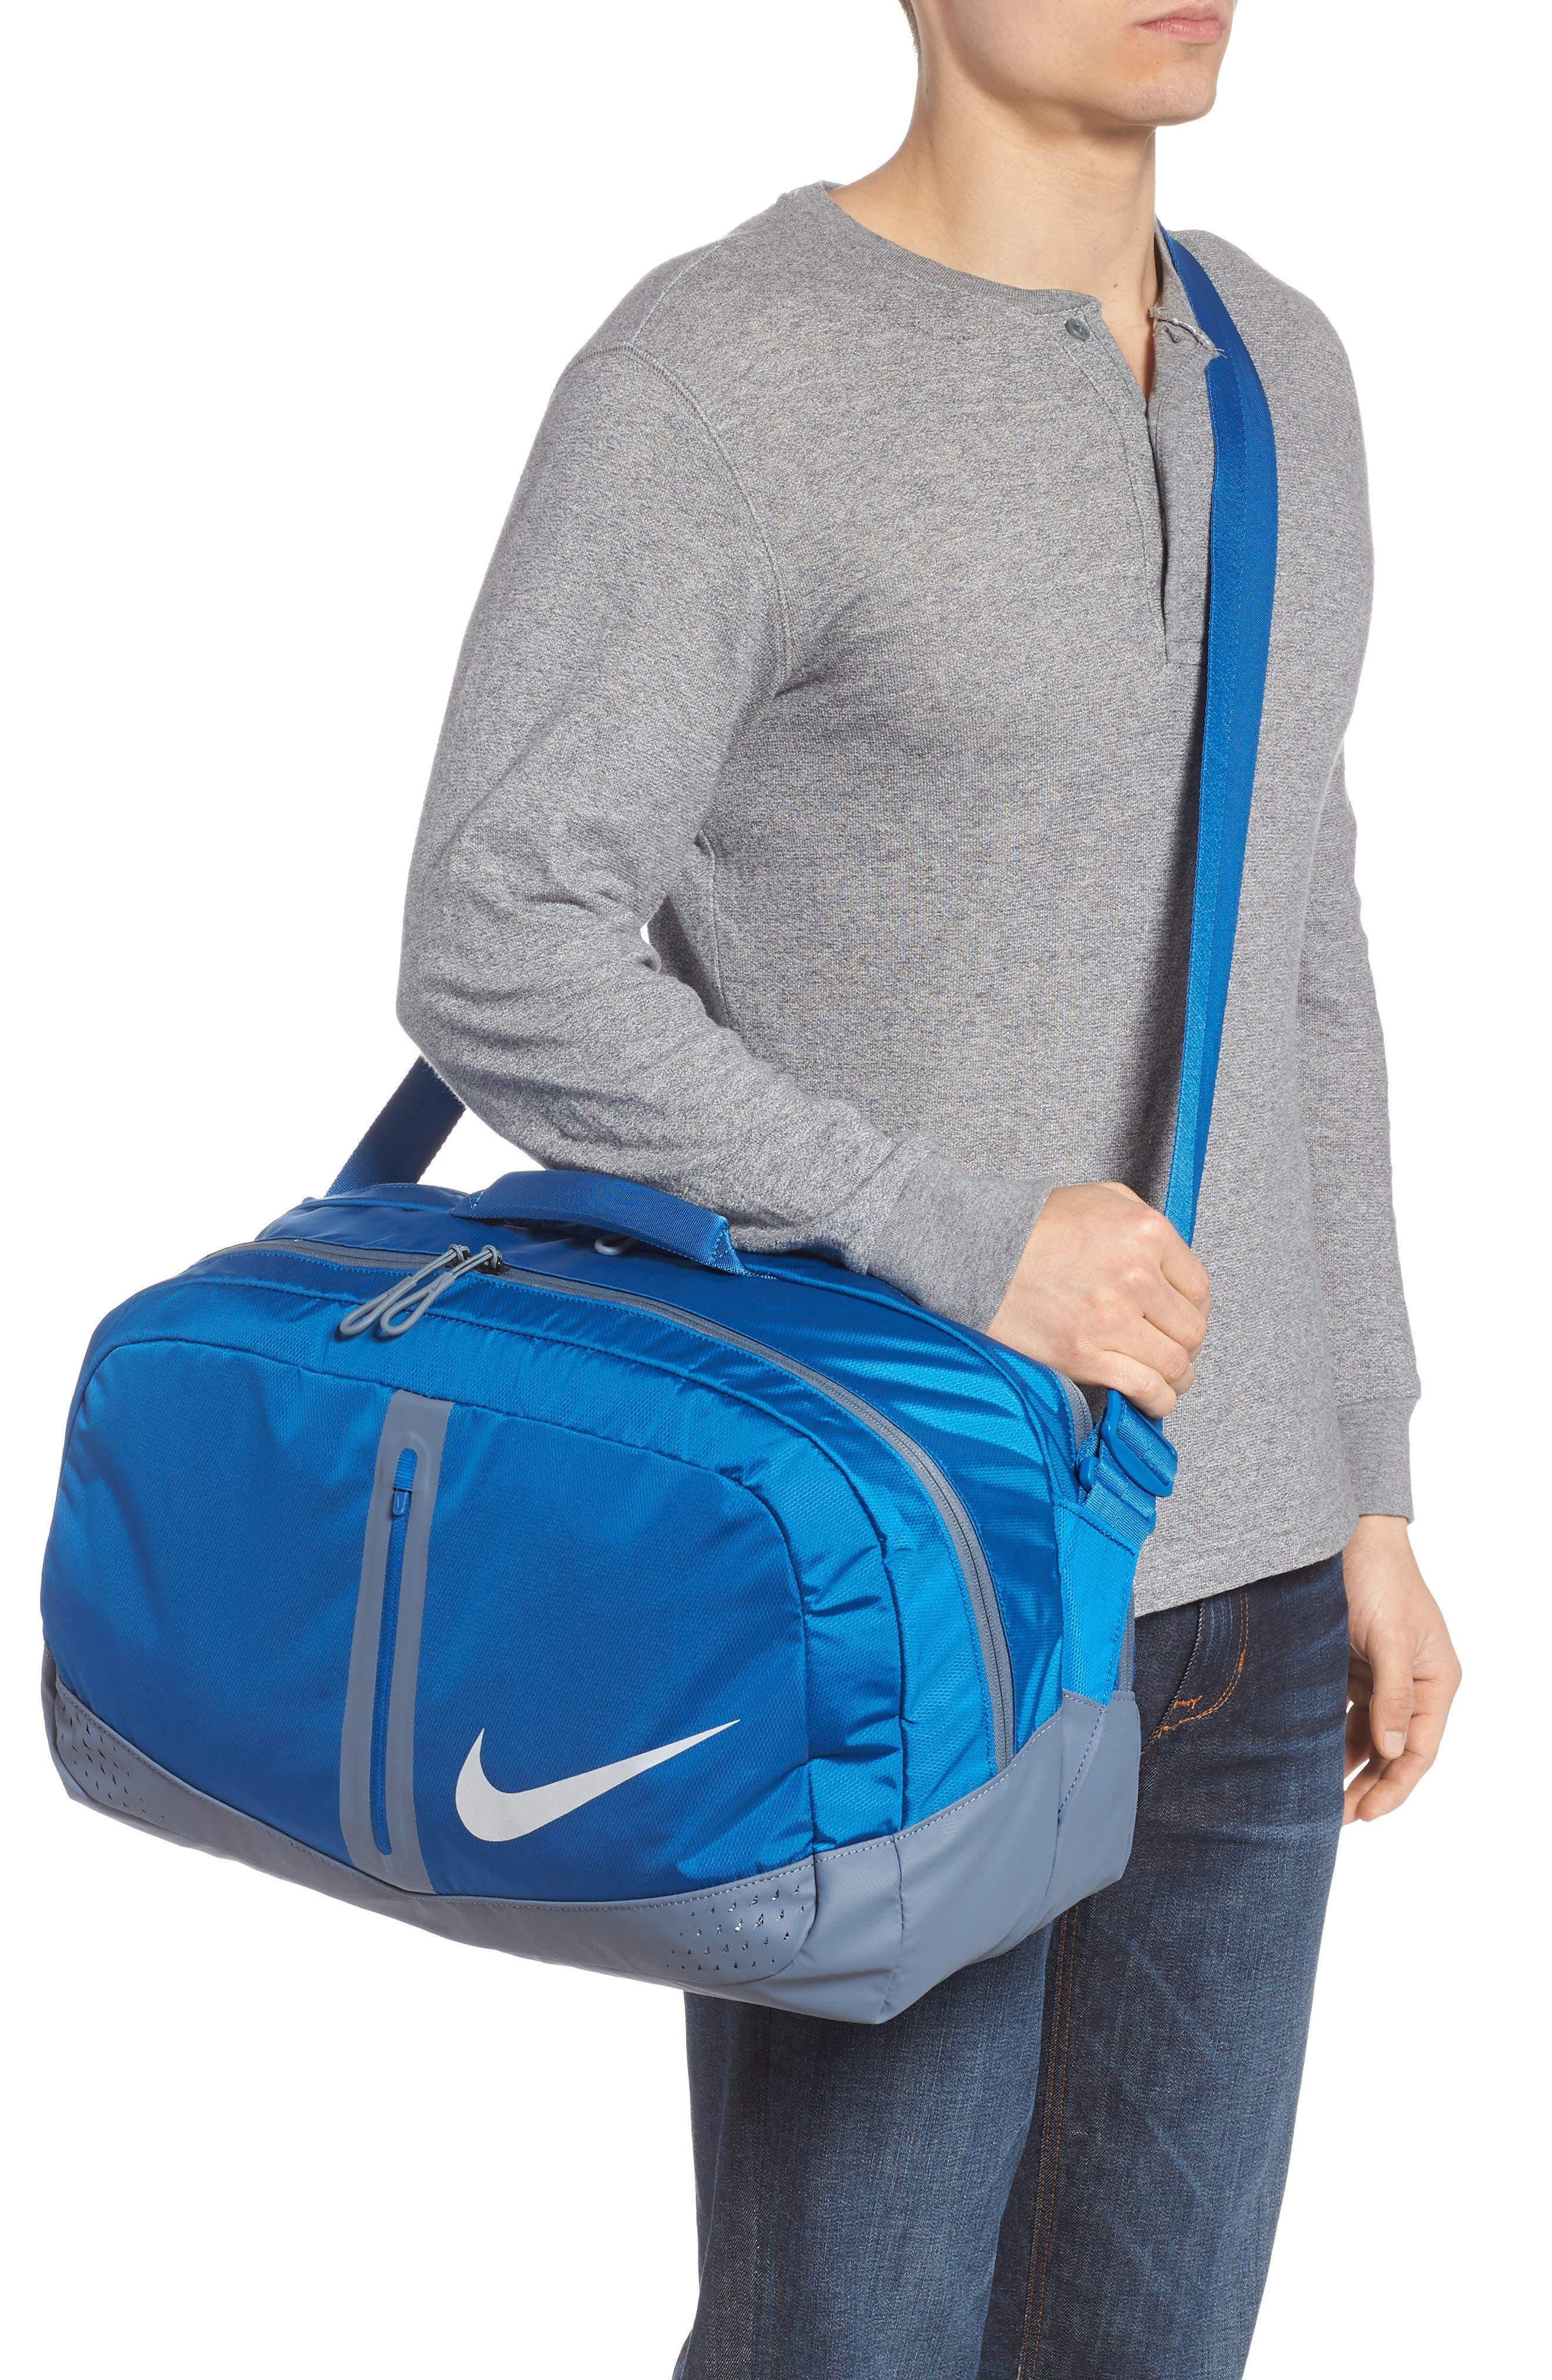 Run Duffel Bag,                             Alternate thumbnail 2, color,                             Blue Jay/ Armory Blue/ Silver